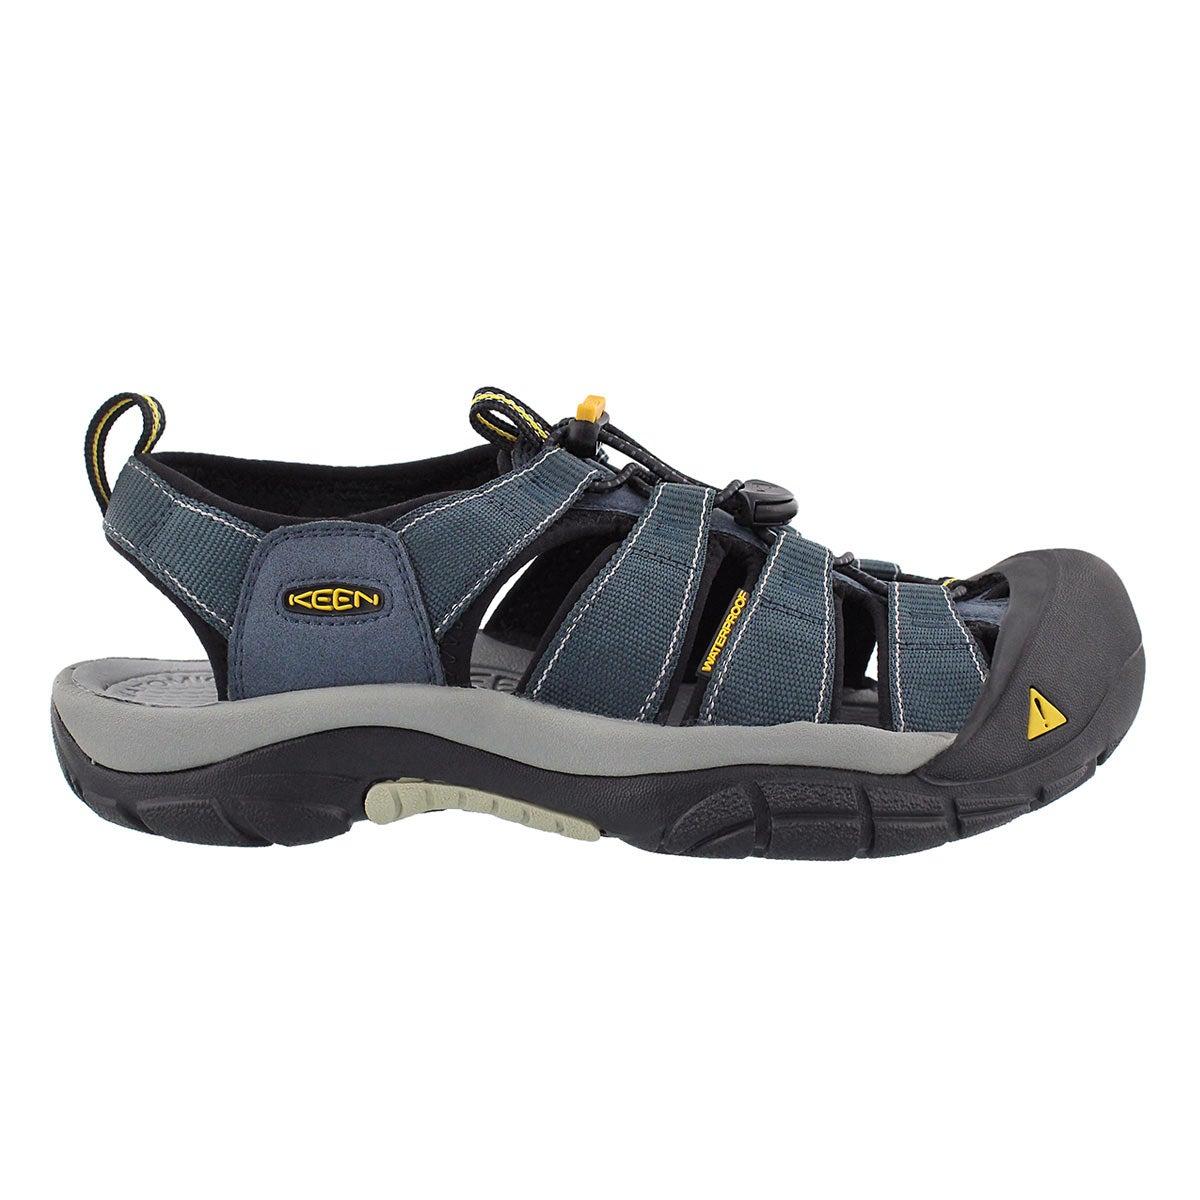 Sandales sport Newport H2, marine, homme